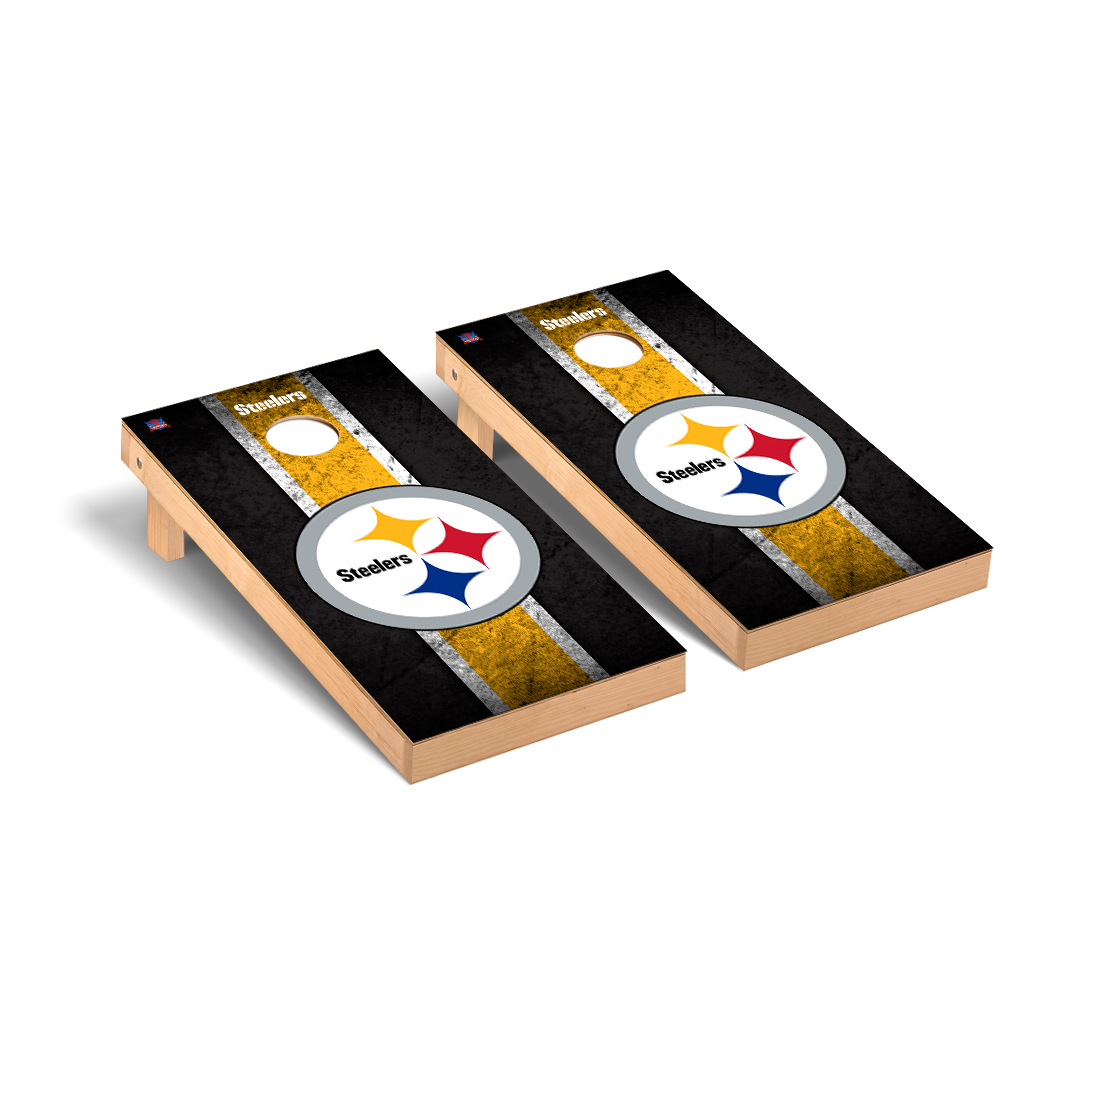 Pittsburgh Steelers NFL Football Cornhole Game Set Vintage Version 2